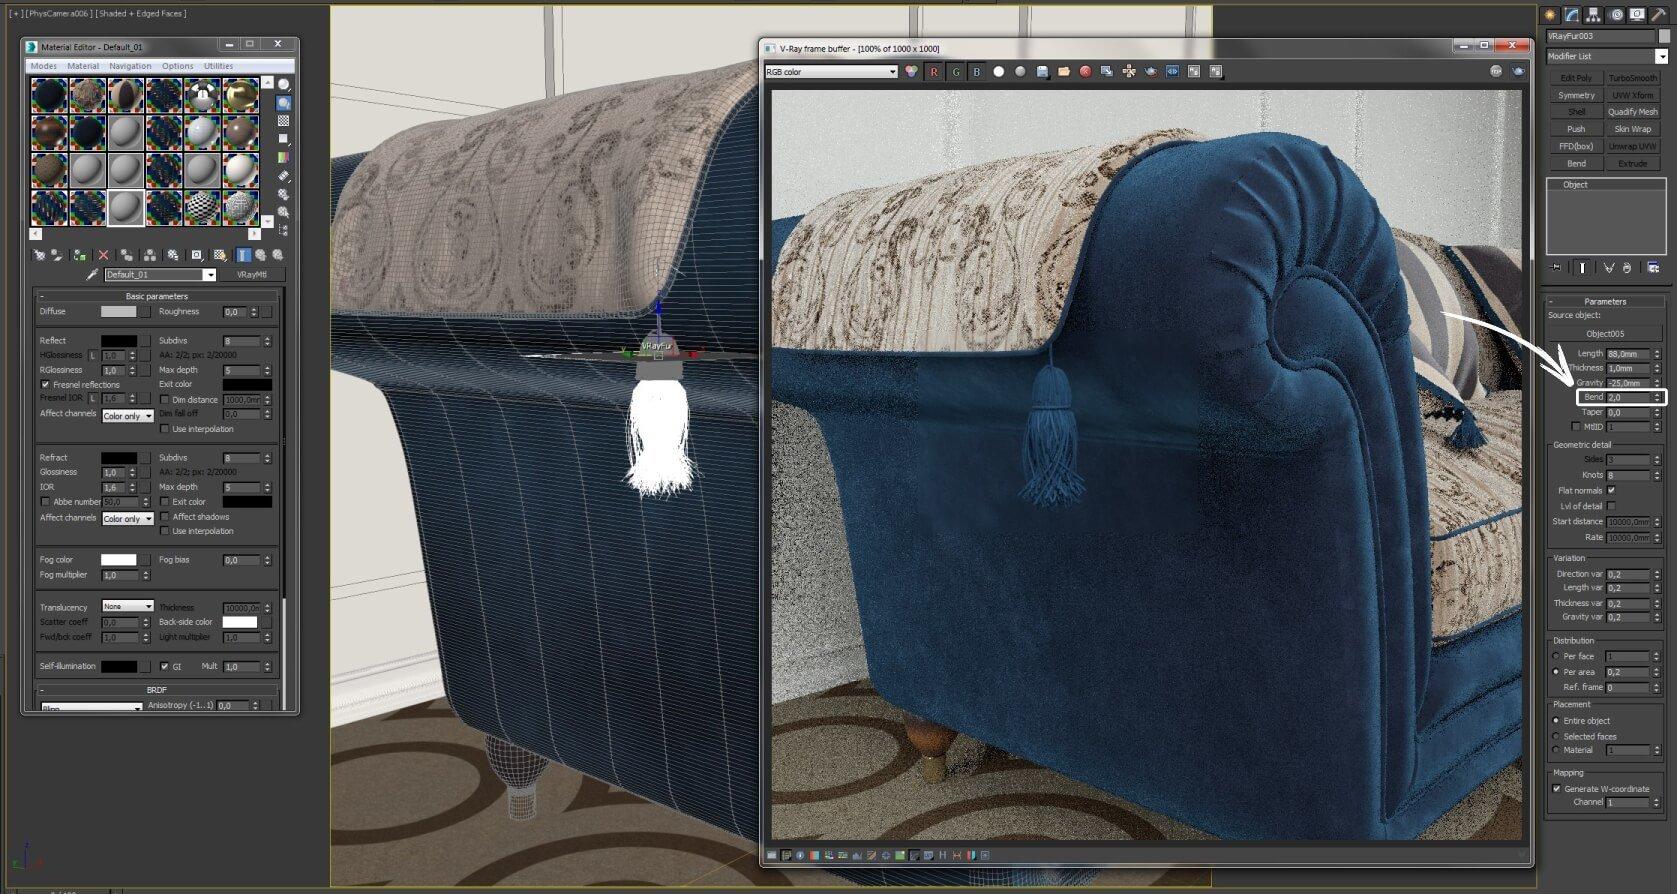 VRay Fur на примере кисточки из пряжи в 3dsMax